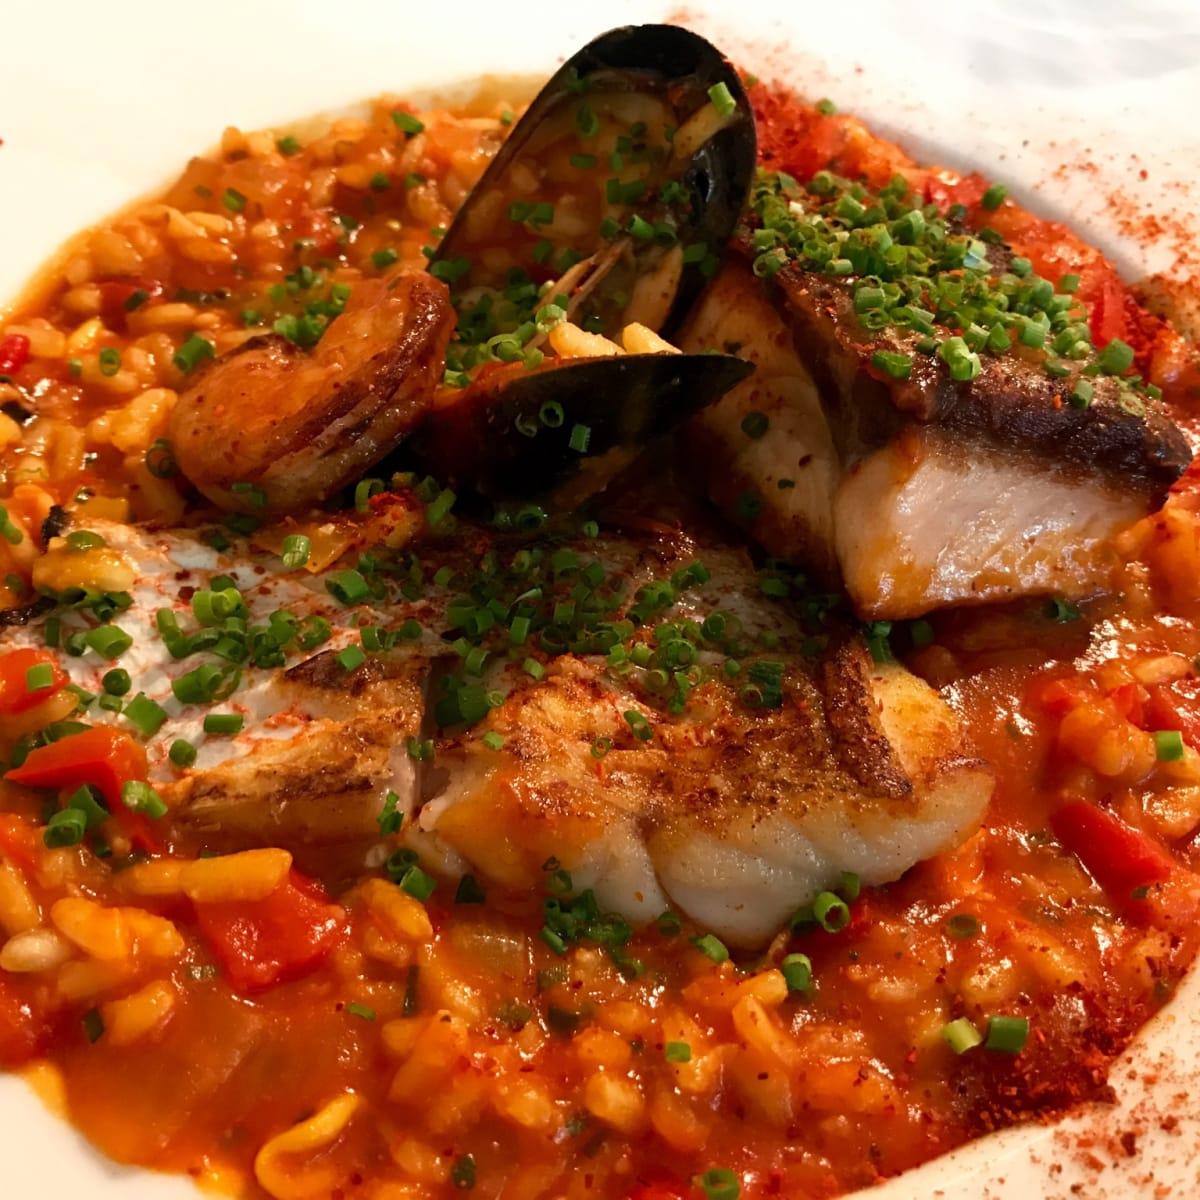 Brasserie du Parc seafood risotto